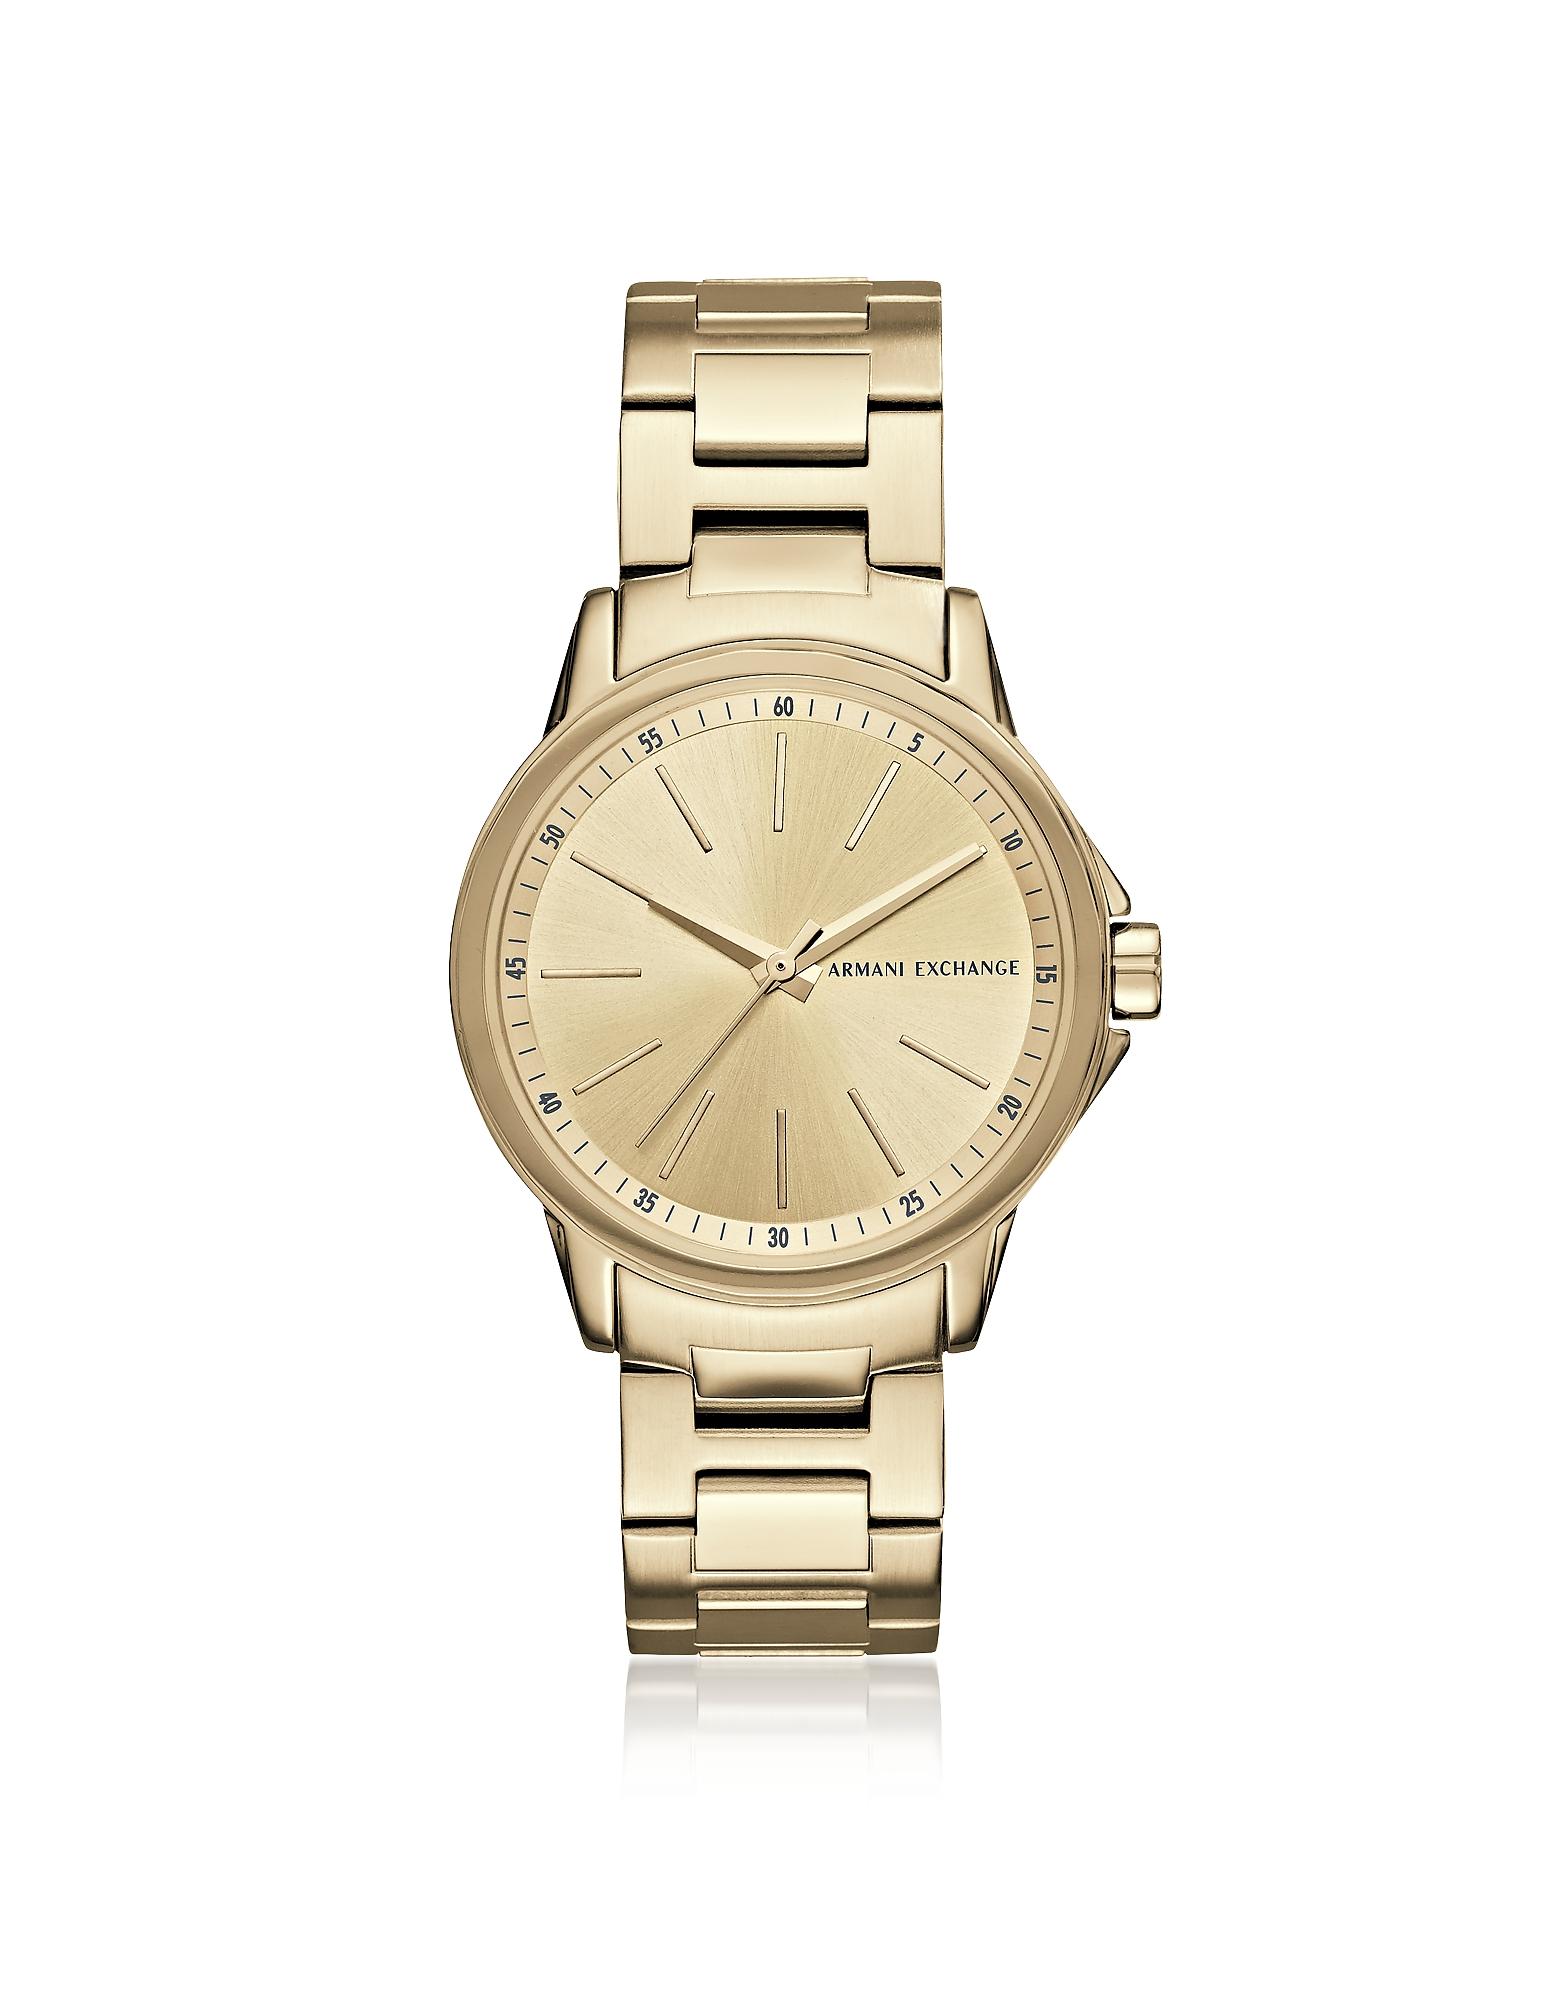 Armani Exchange Women's Watches, Lady Banks Gold PVD Women's Watch